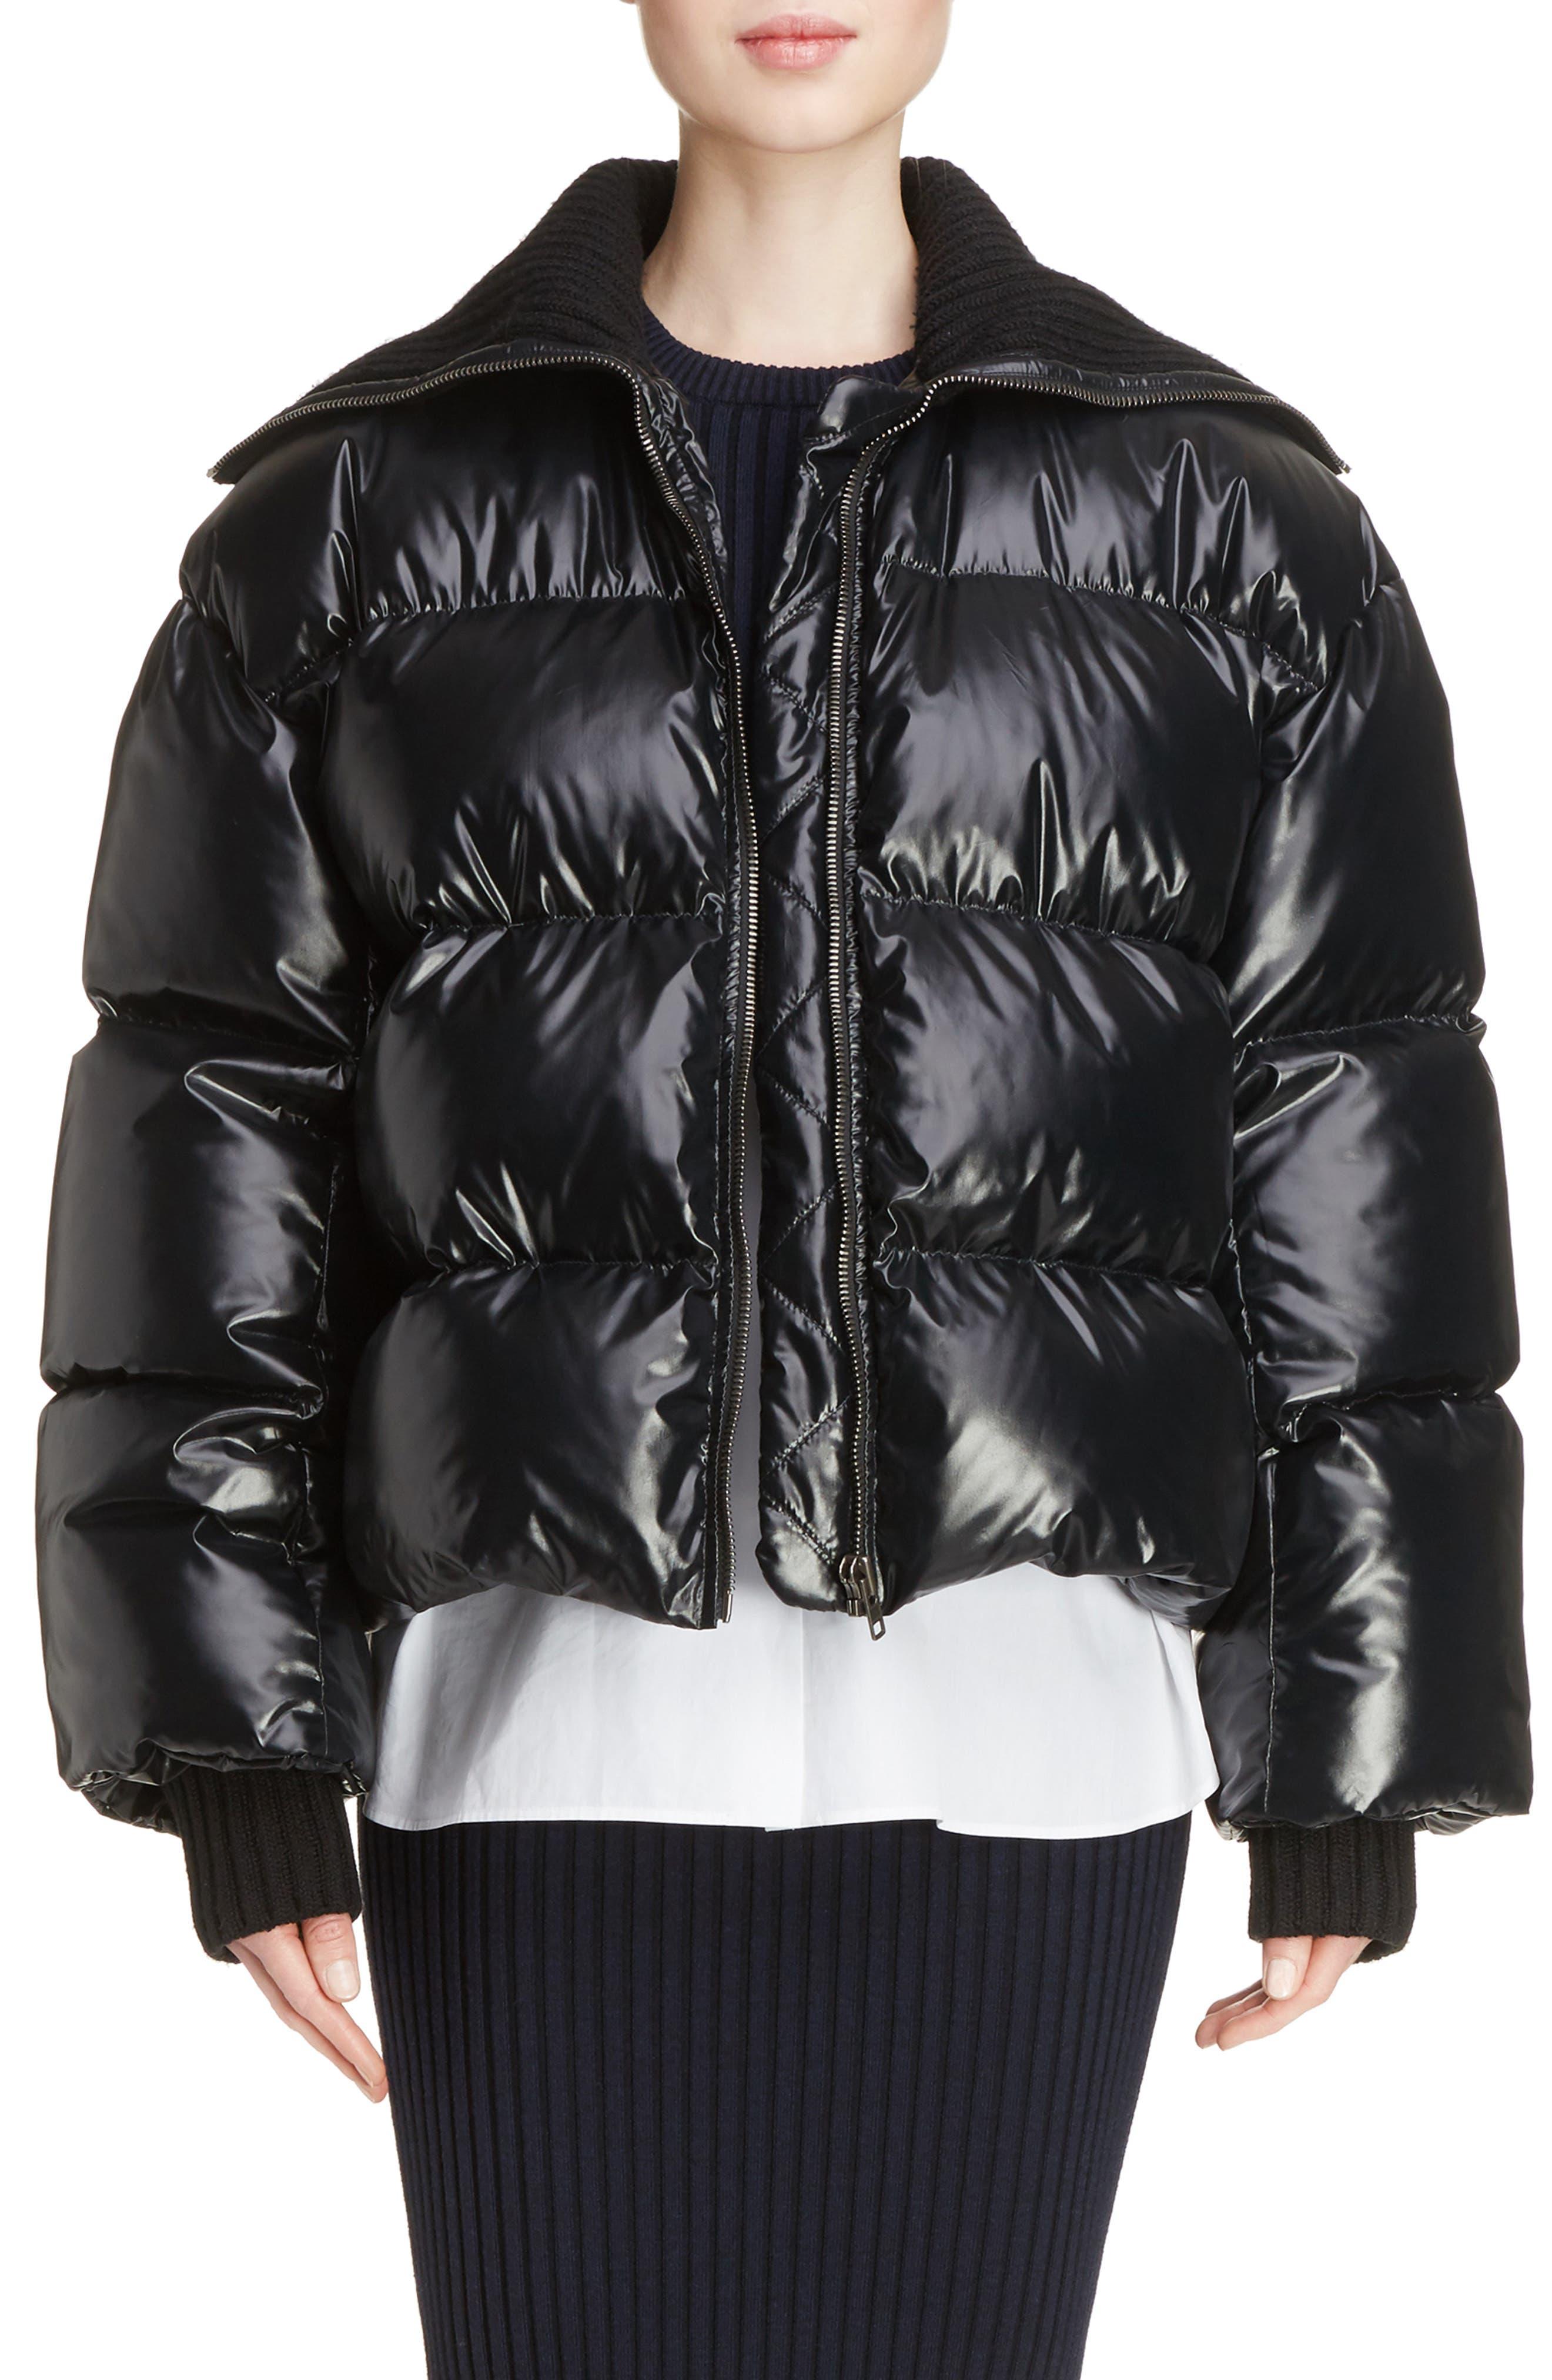 KENZO, Crop Down Puffer Jacket, Main thumbnail 1, color, 001